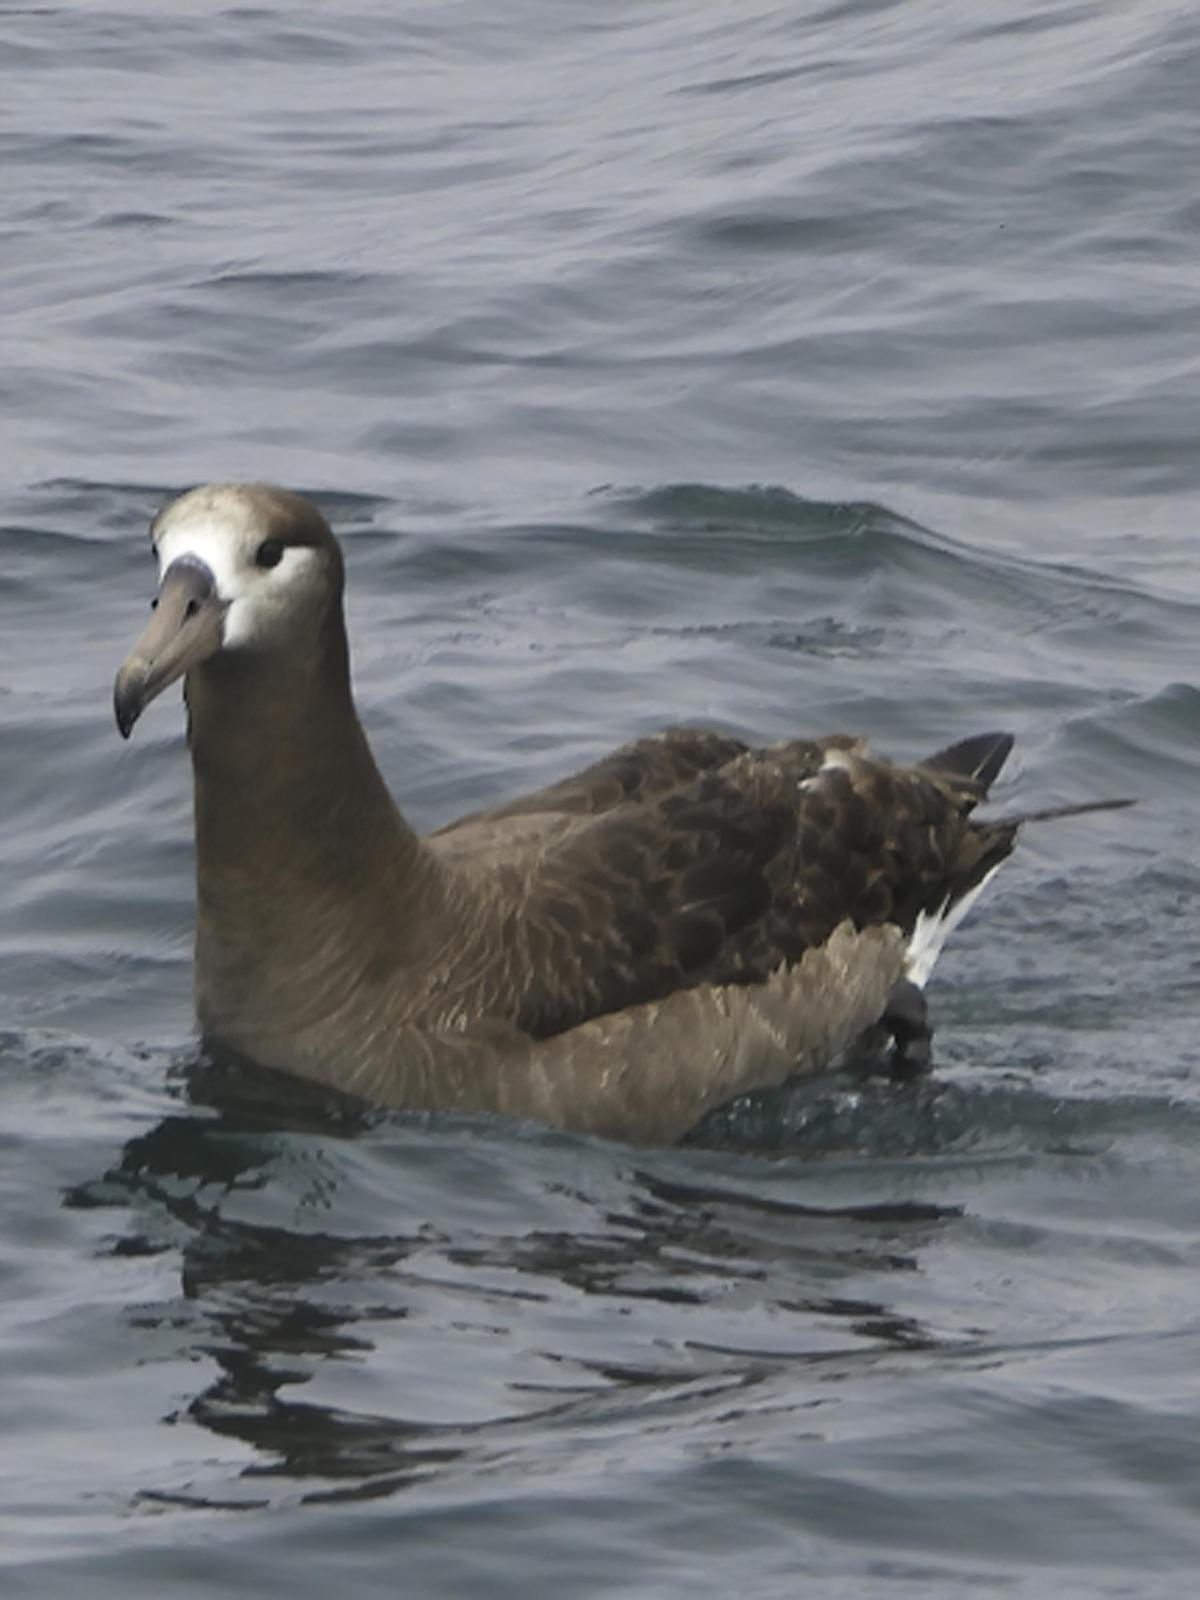 Black-footed Albatross Photo by Dan Tallman